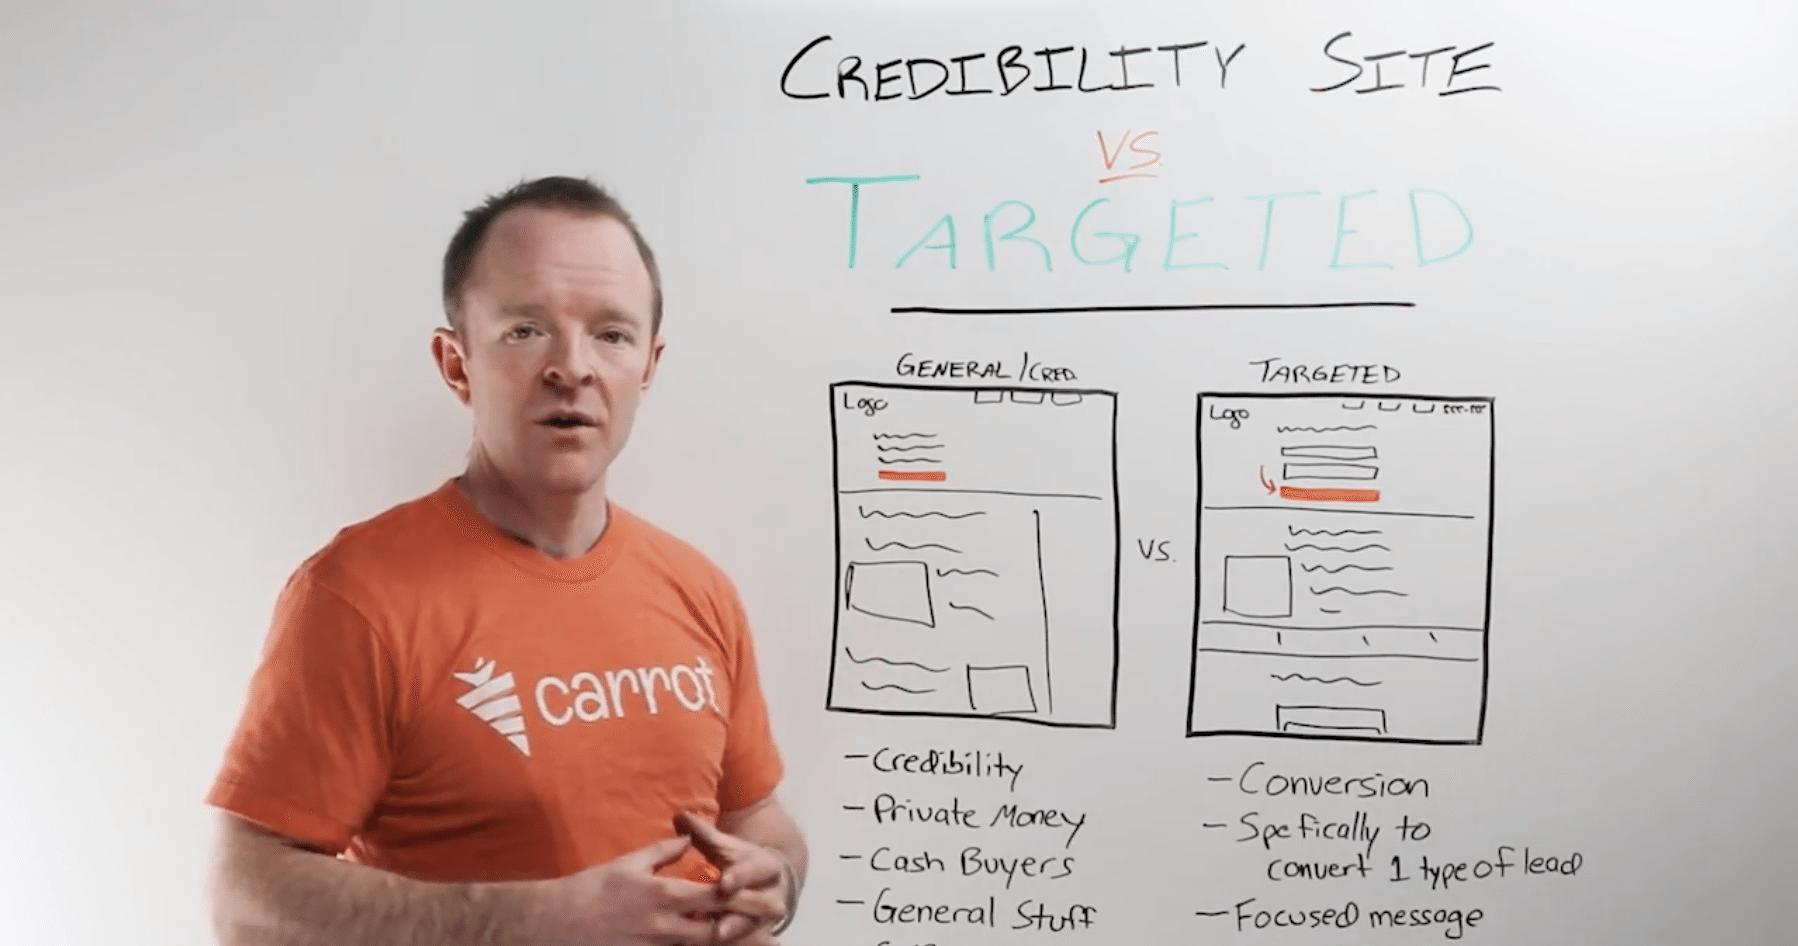 real estate websites- credibility vs targeted sites